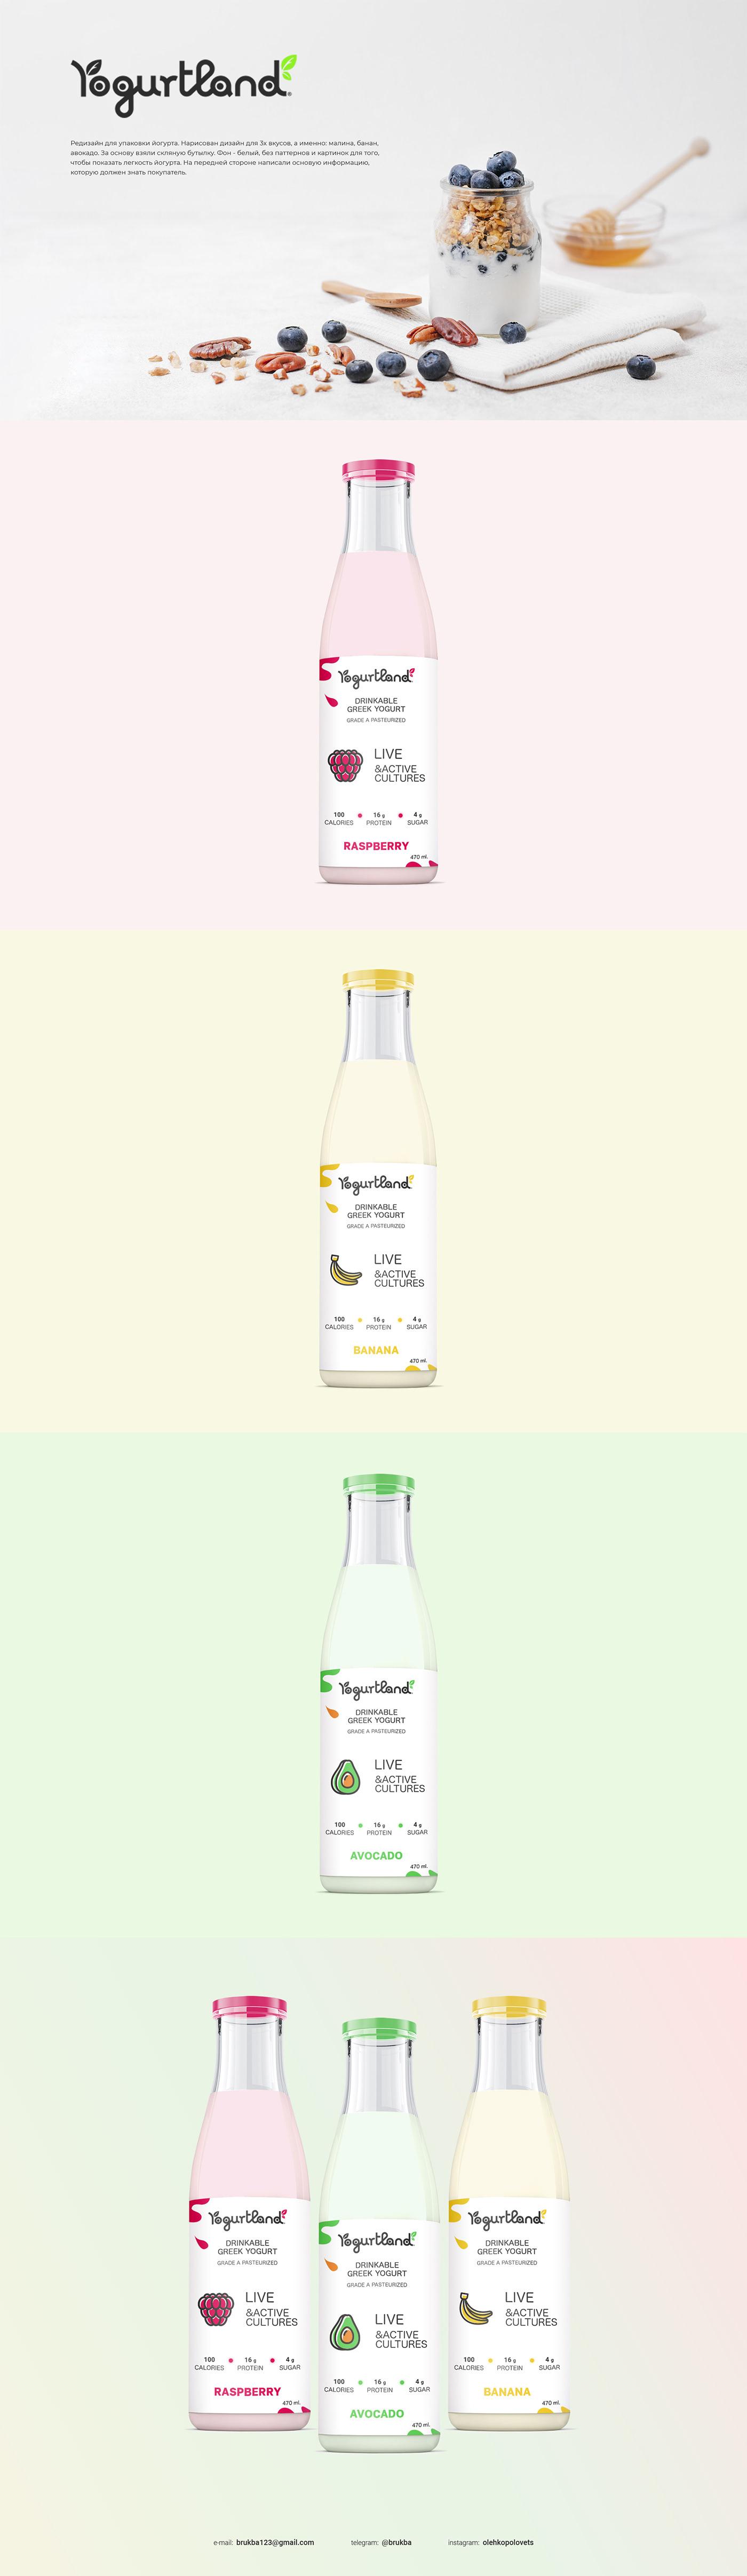 design design for yogurt Packaging yogurt